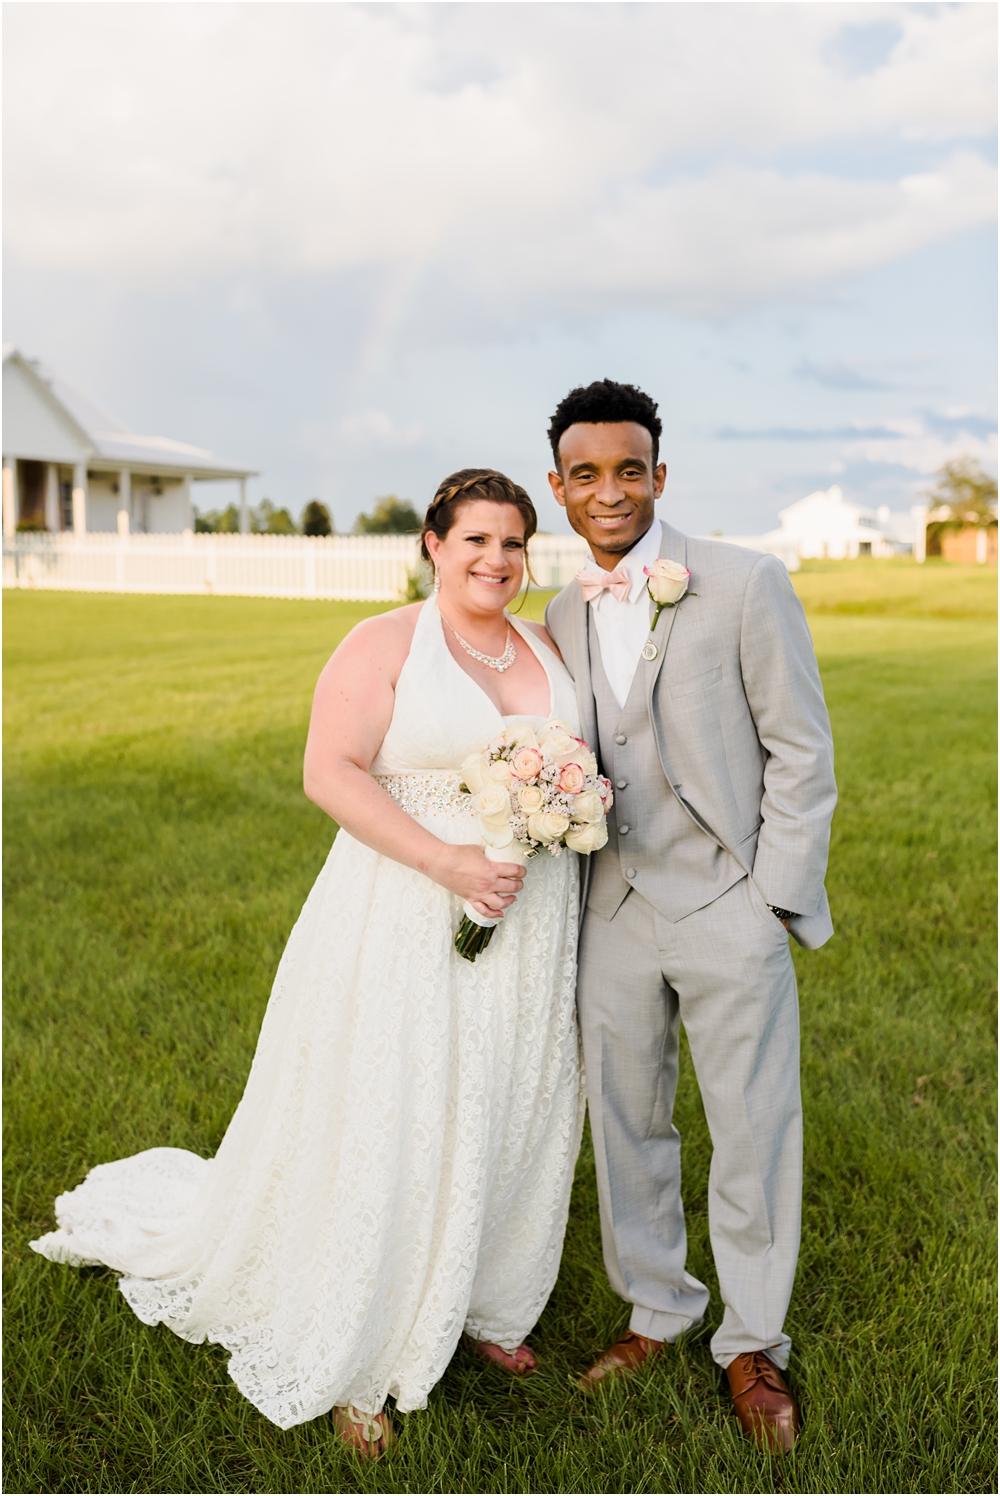 mosley-wedding-kiersten-stevenson-photography-30a-panama-city-beach-dothan-tallahassee-(238-of-472).JPG